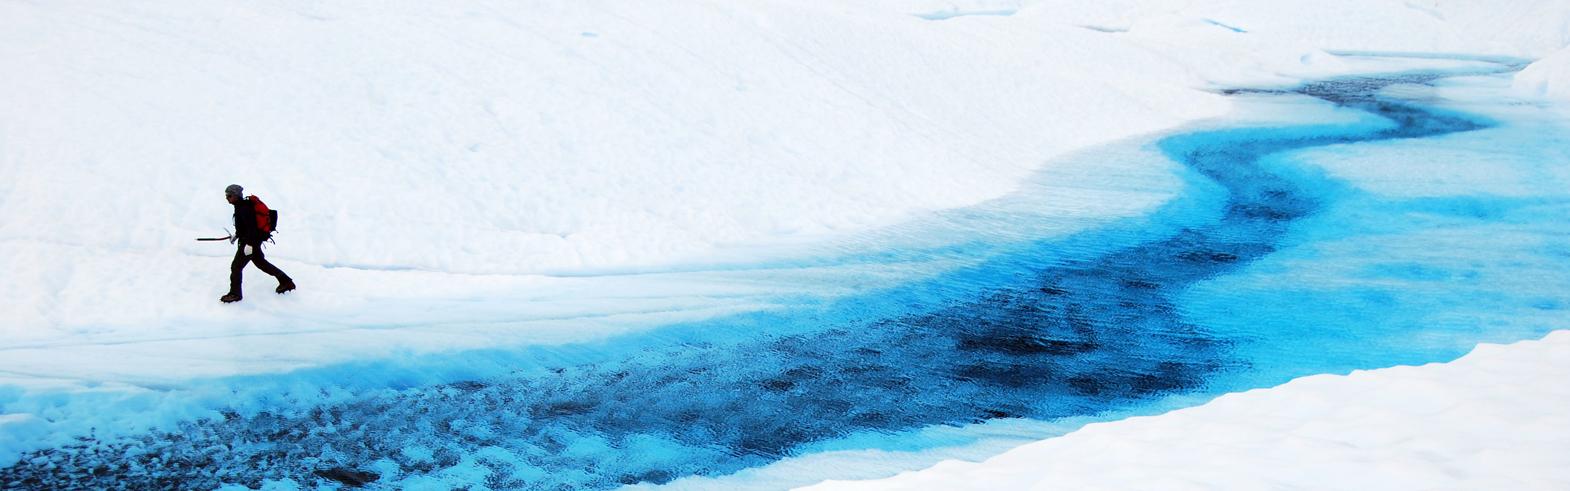 trekking-patagonia2-taranna